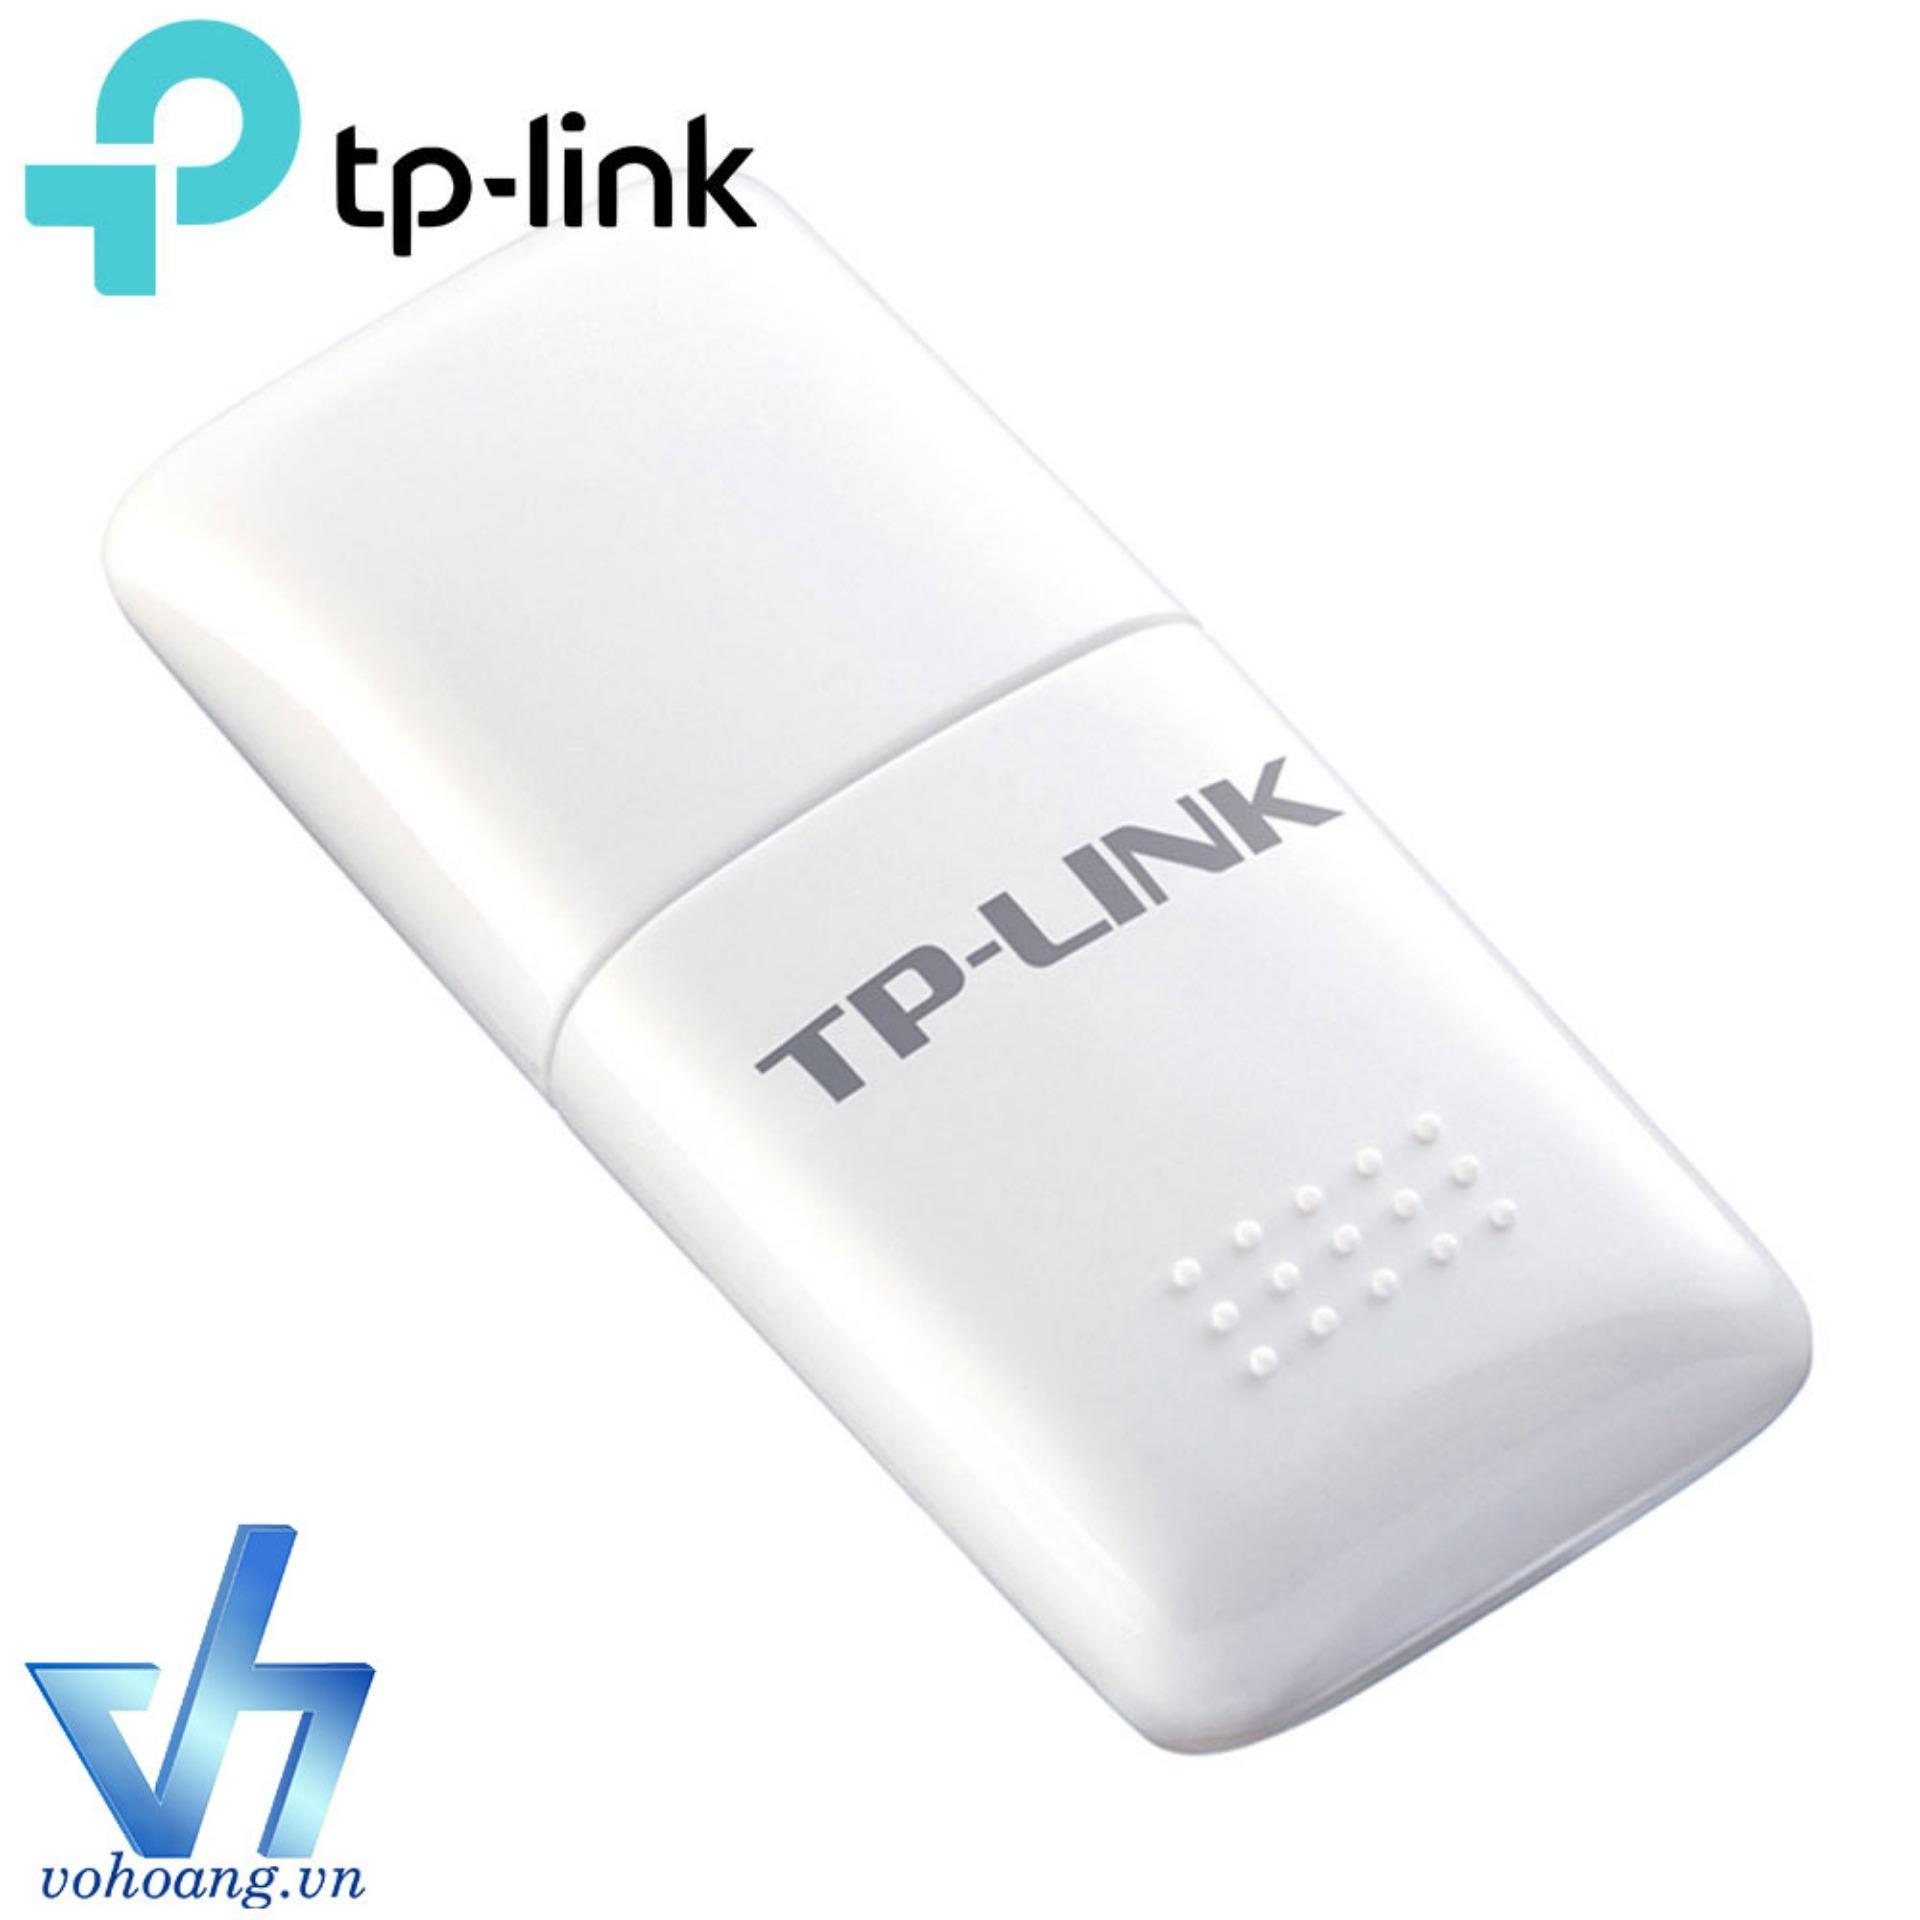 Usb Thu Wifi Tp Link Tl Wn723n White Adapter Mng H Ch Minh Ftpcomputercom